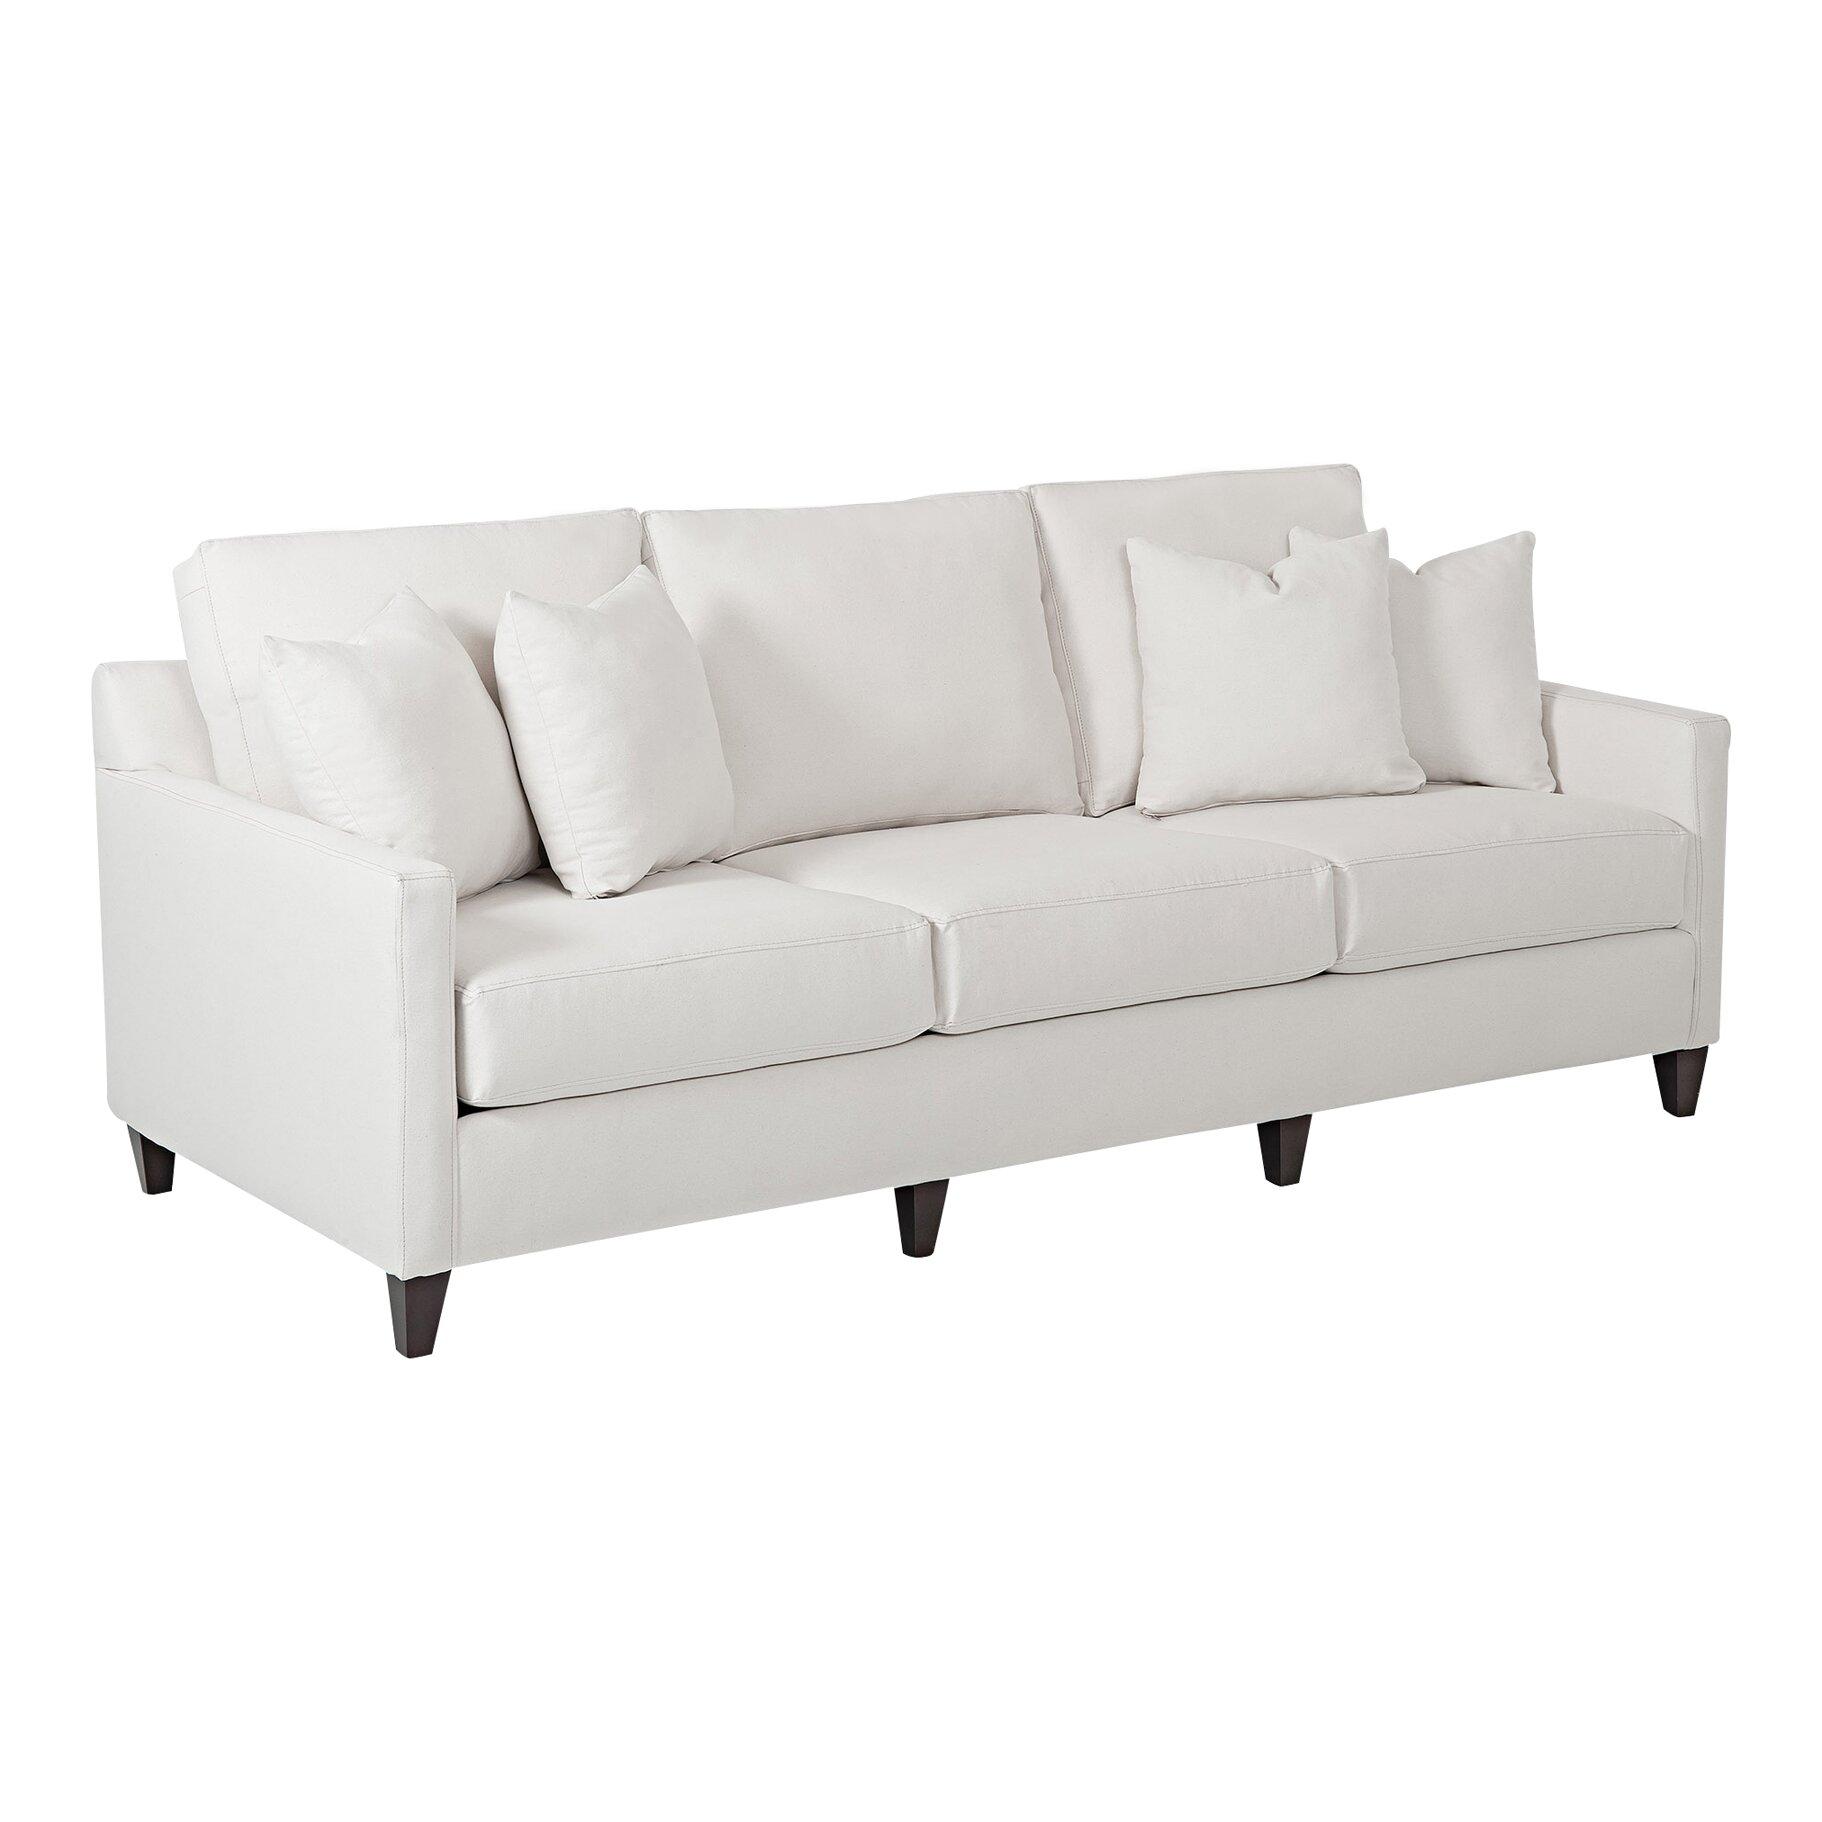 Wayfair Custom Upholstery Spencer Sofa Reviews